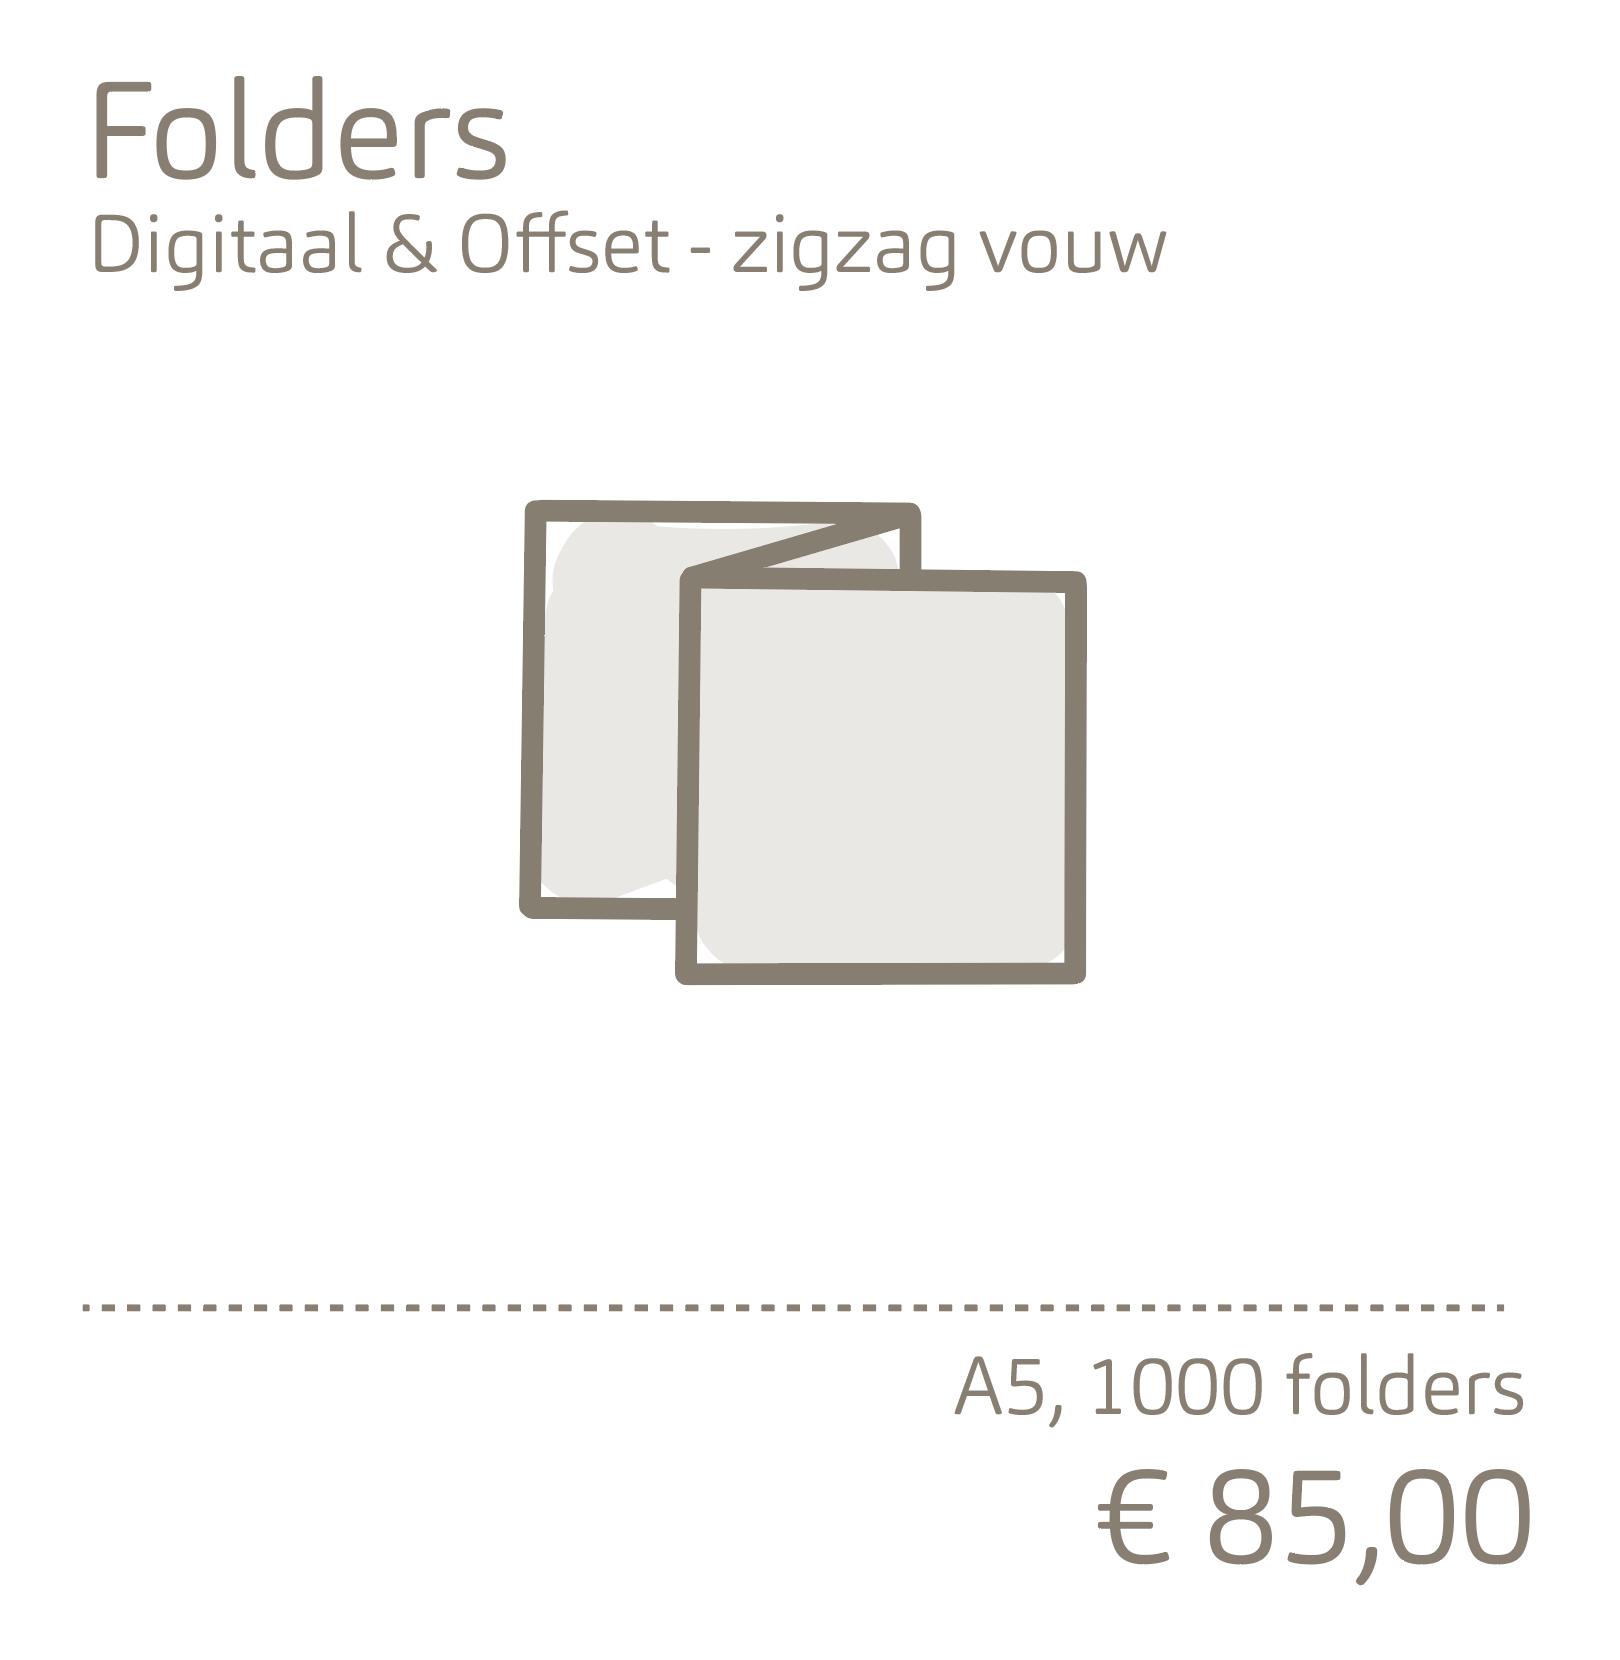 Folders-zigzag vouw